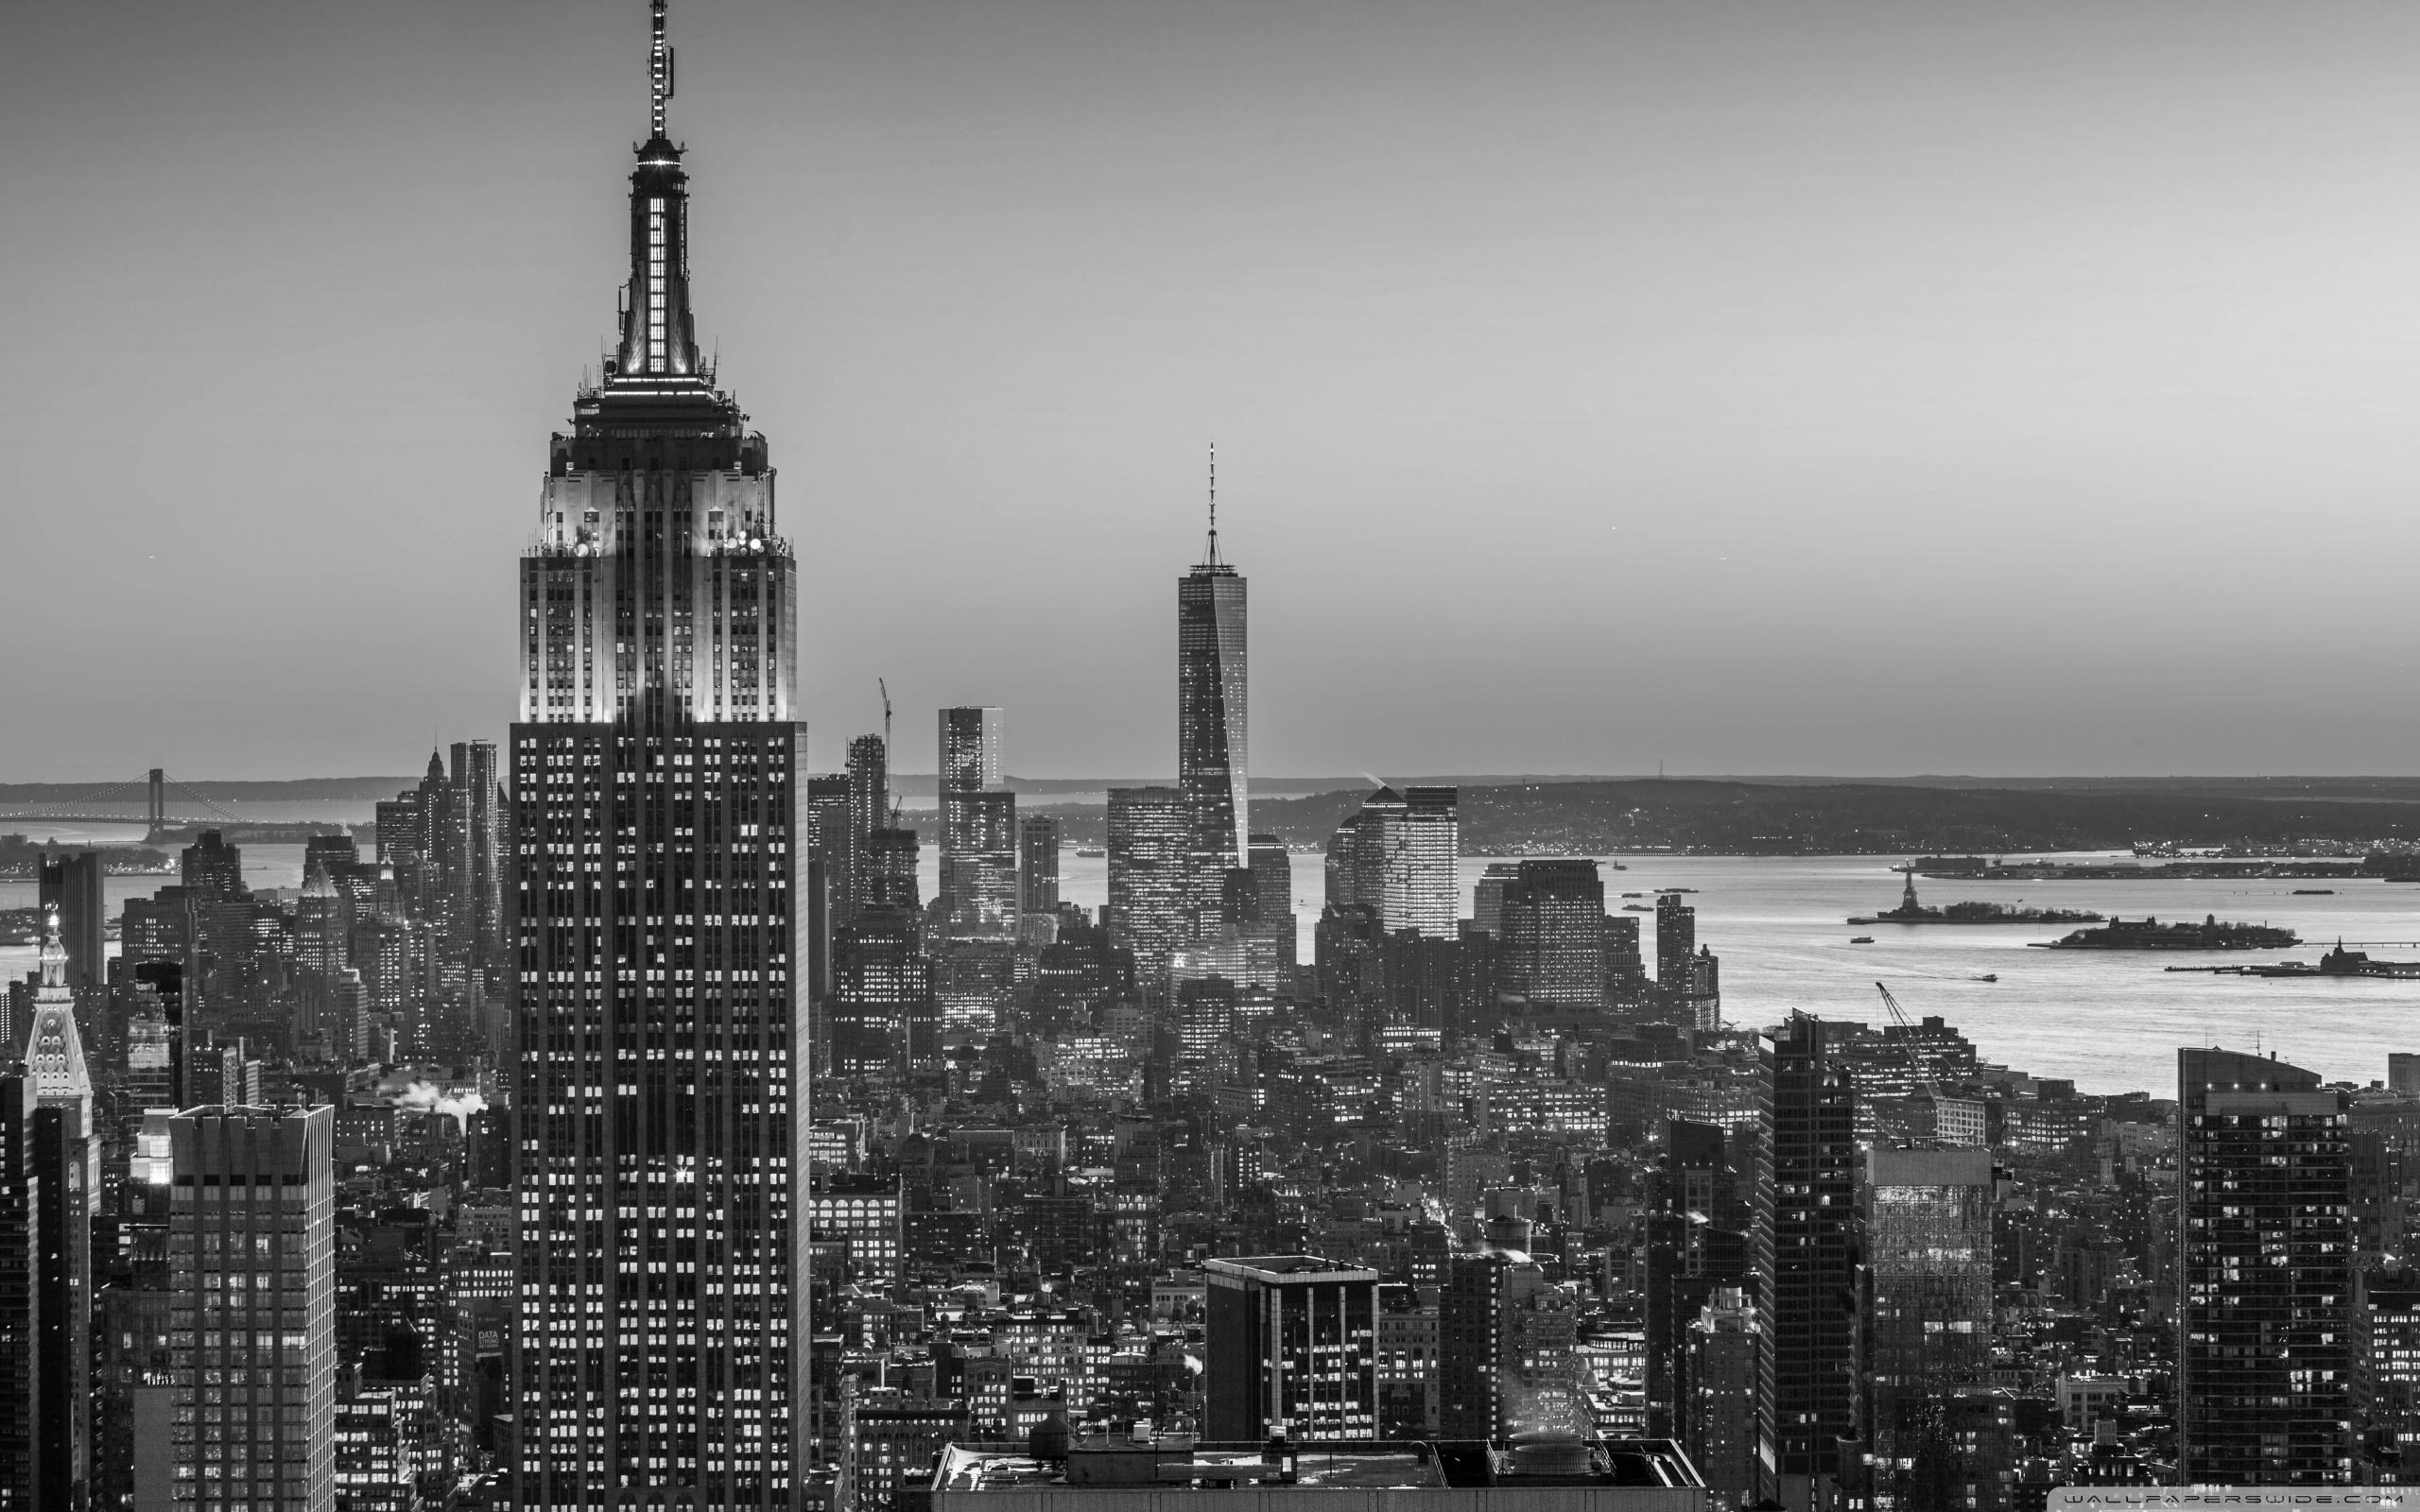 Empire State Building New York City Monochrome Ultra Hd